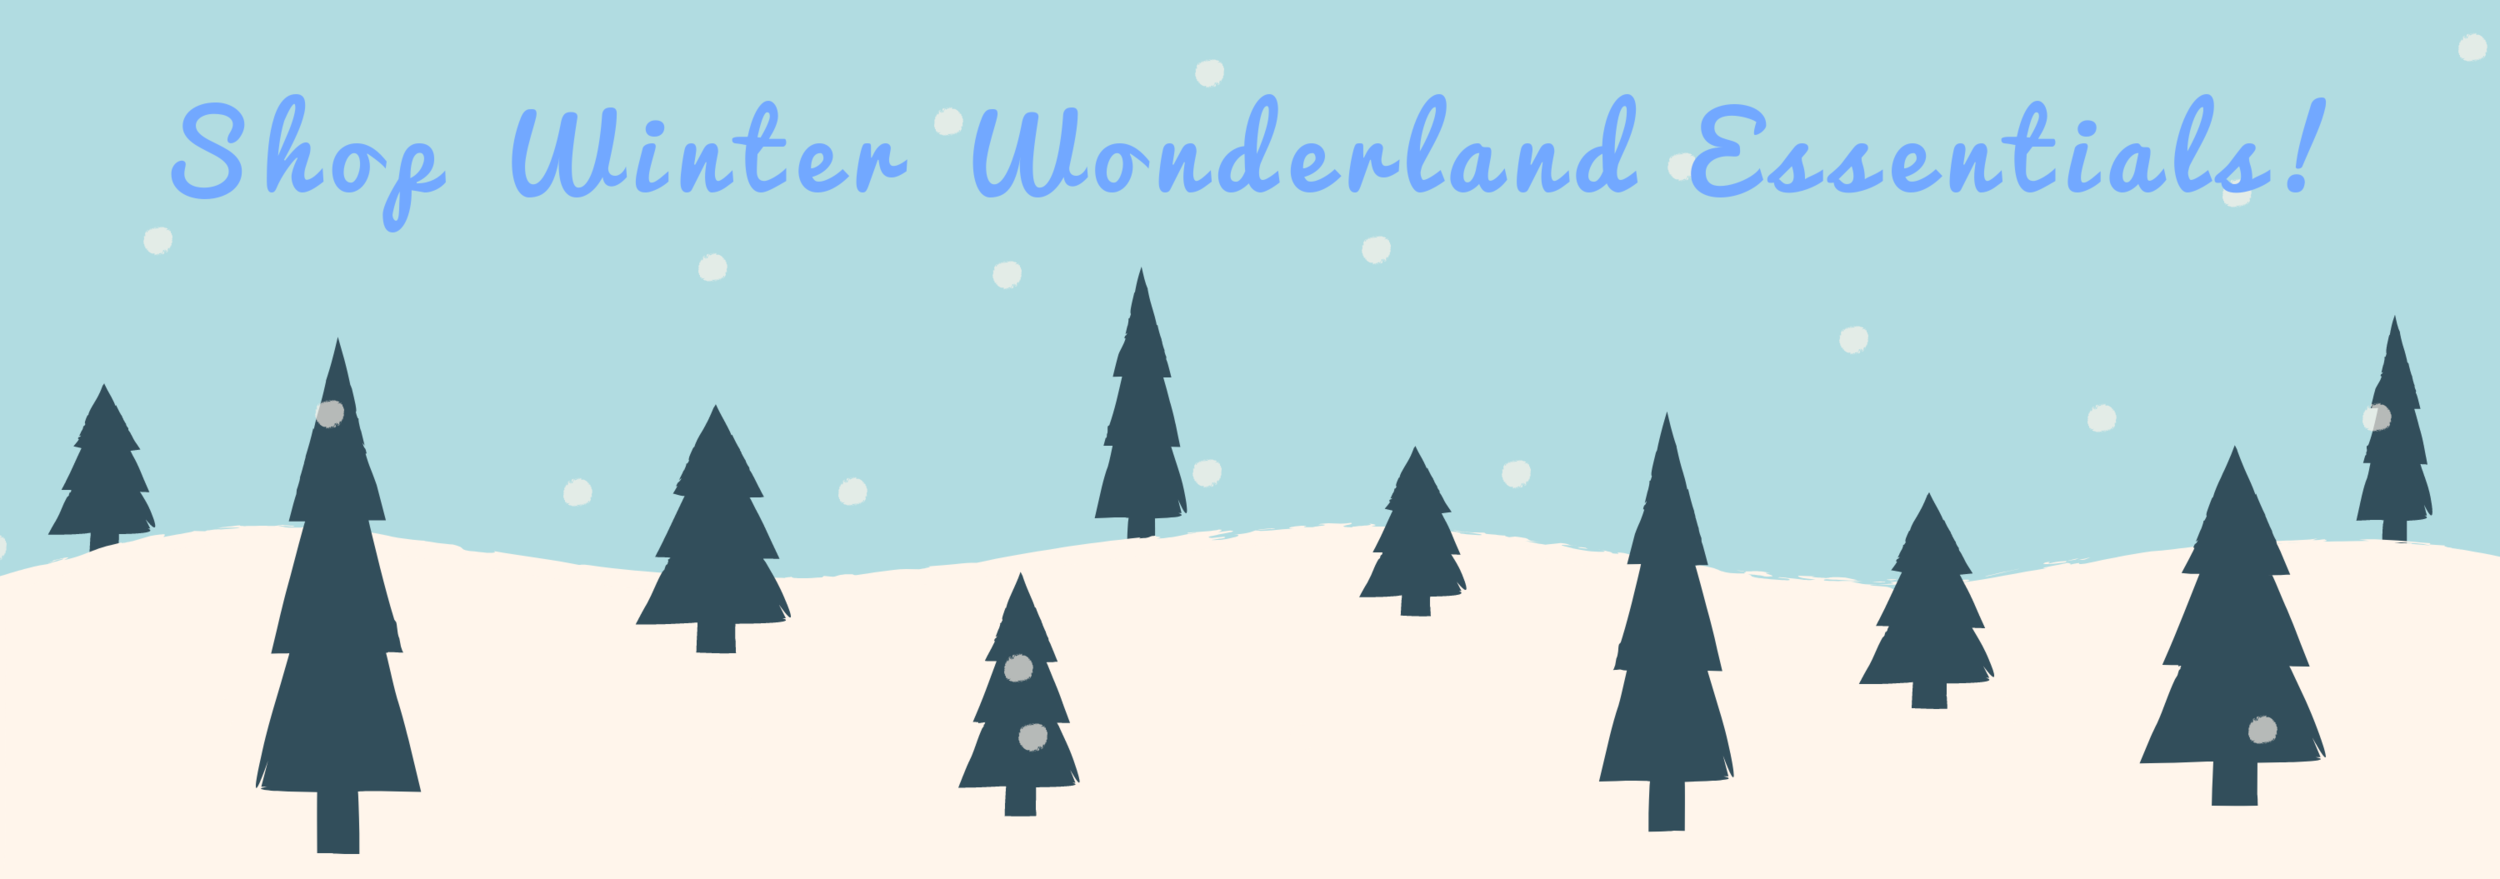 Shop the Winter Wonderland collection!